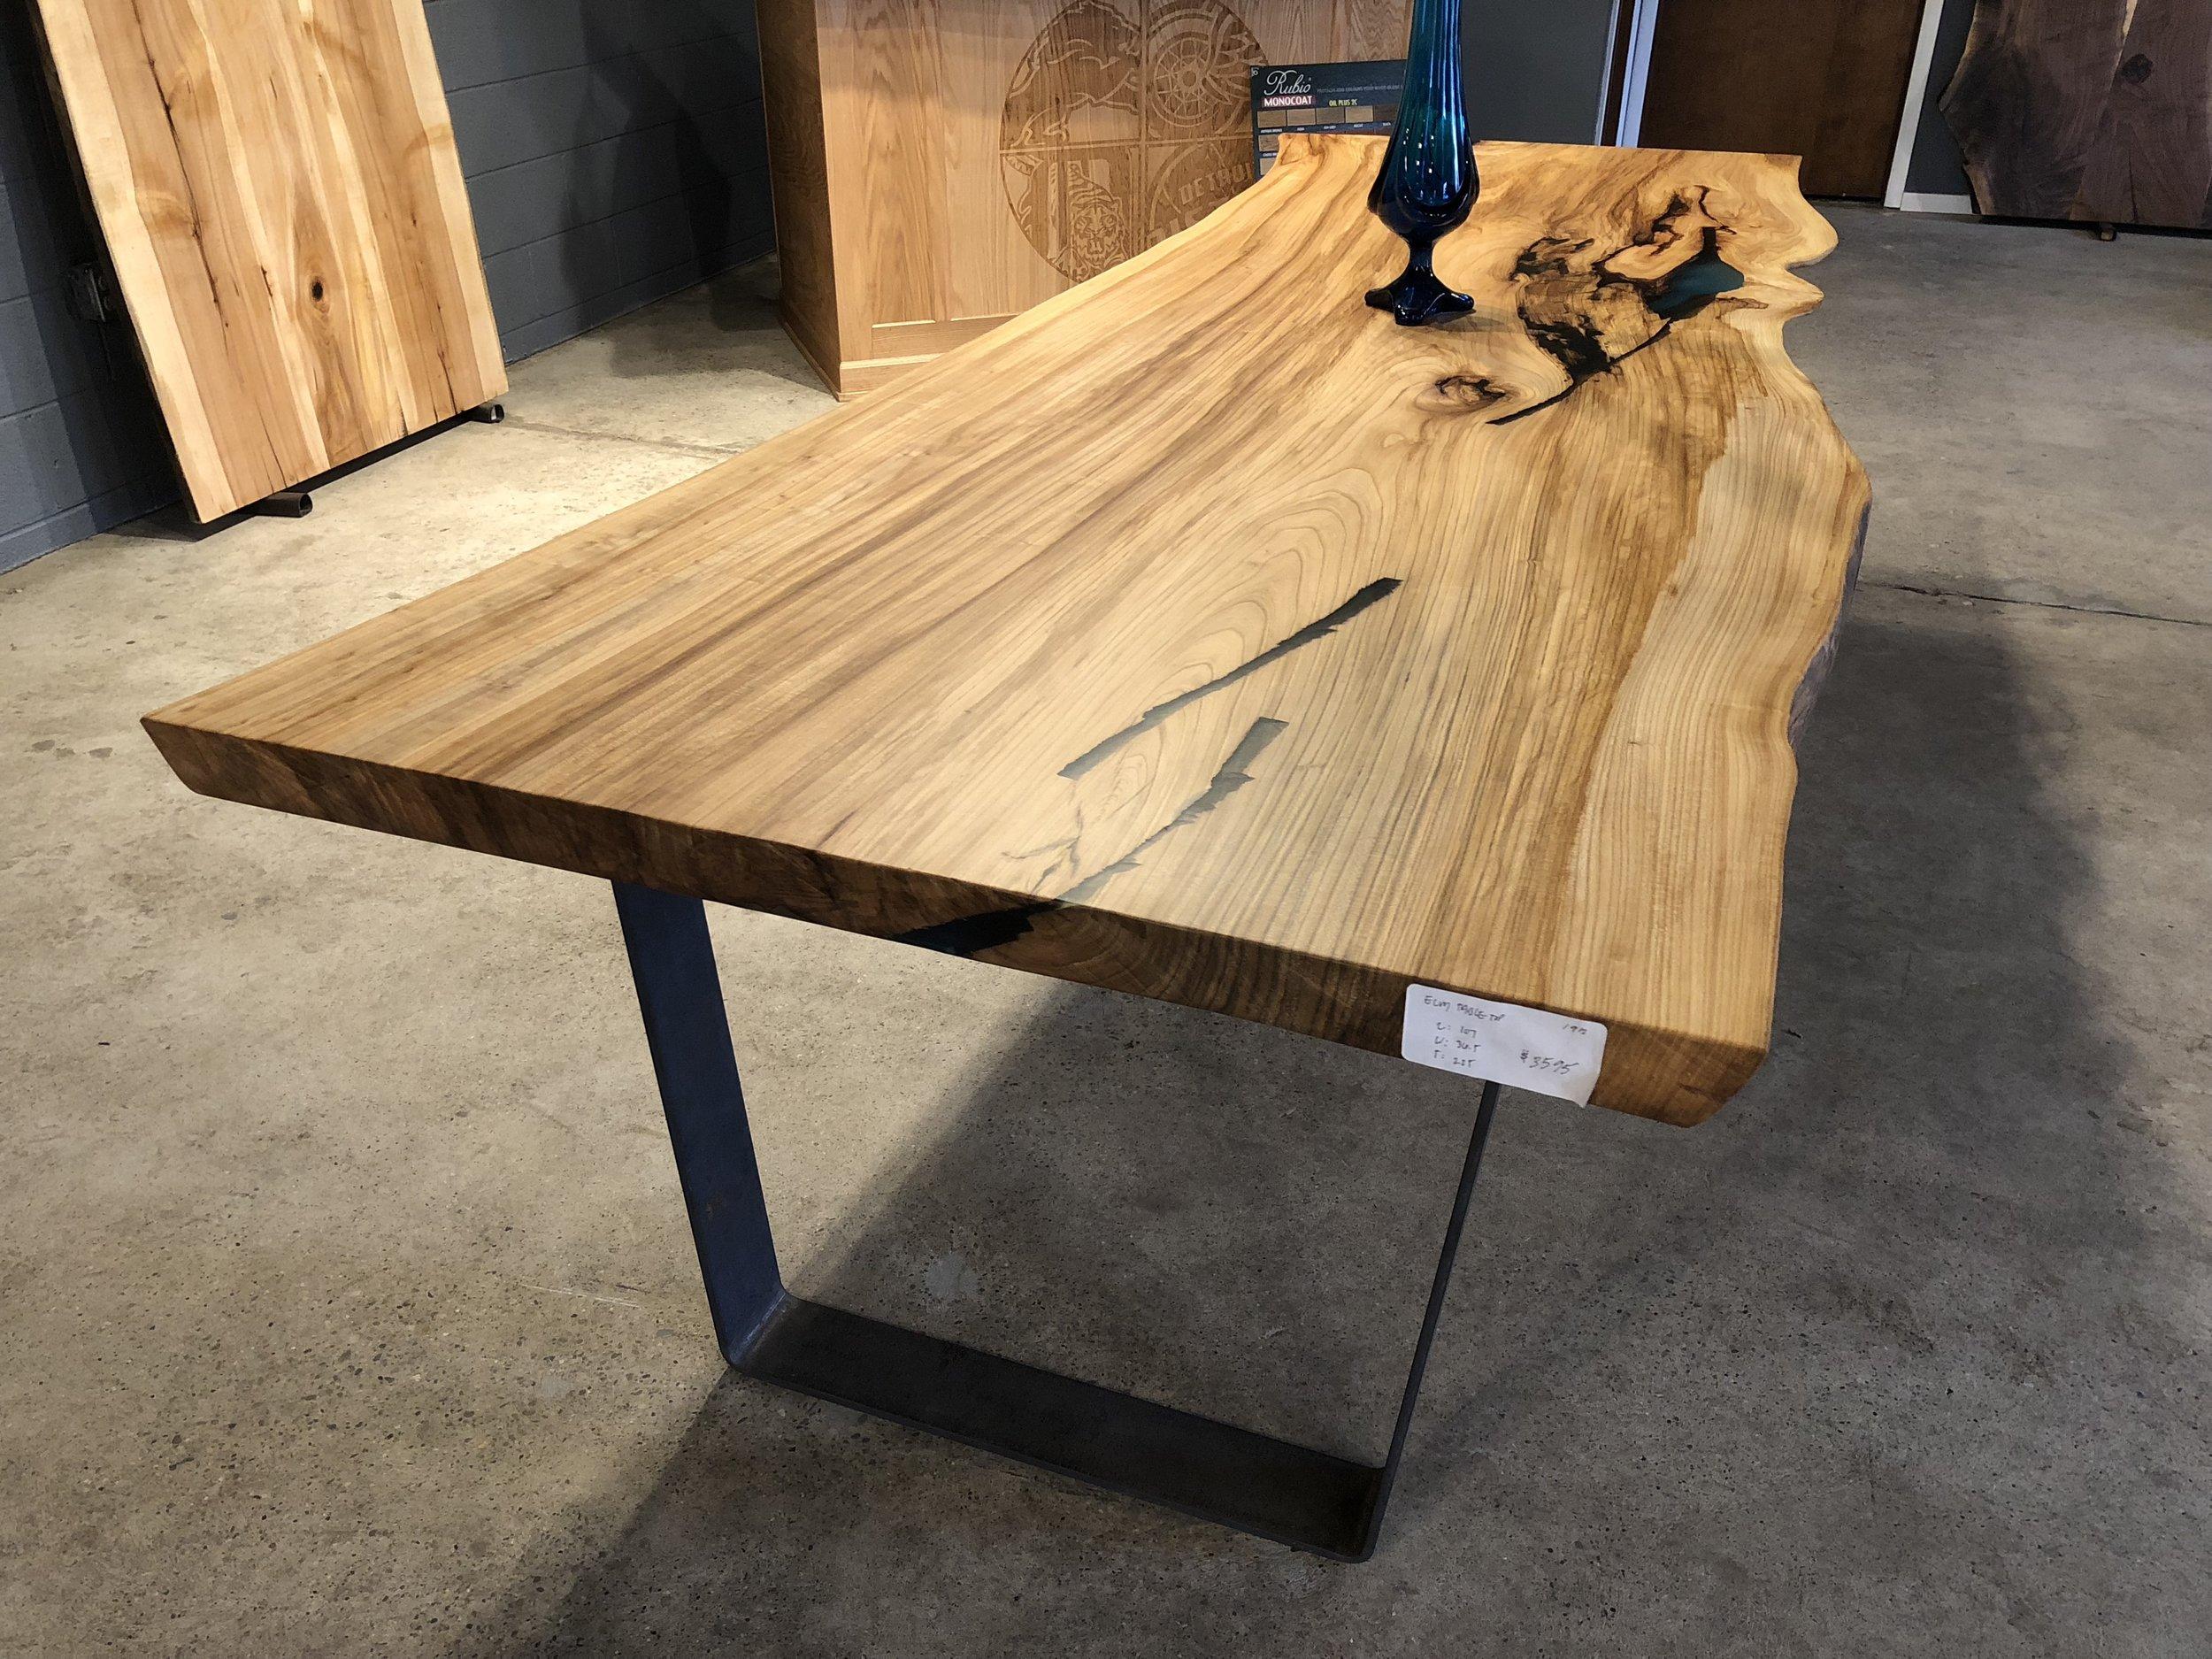 American Elm Slab Dining Table Tree Purposed Detroit Michigan Live Edge Slabs Reclaimed Wood